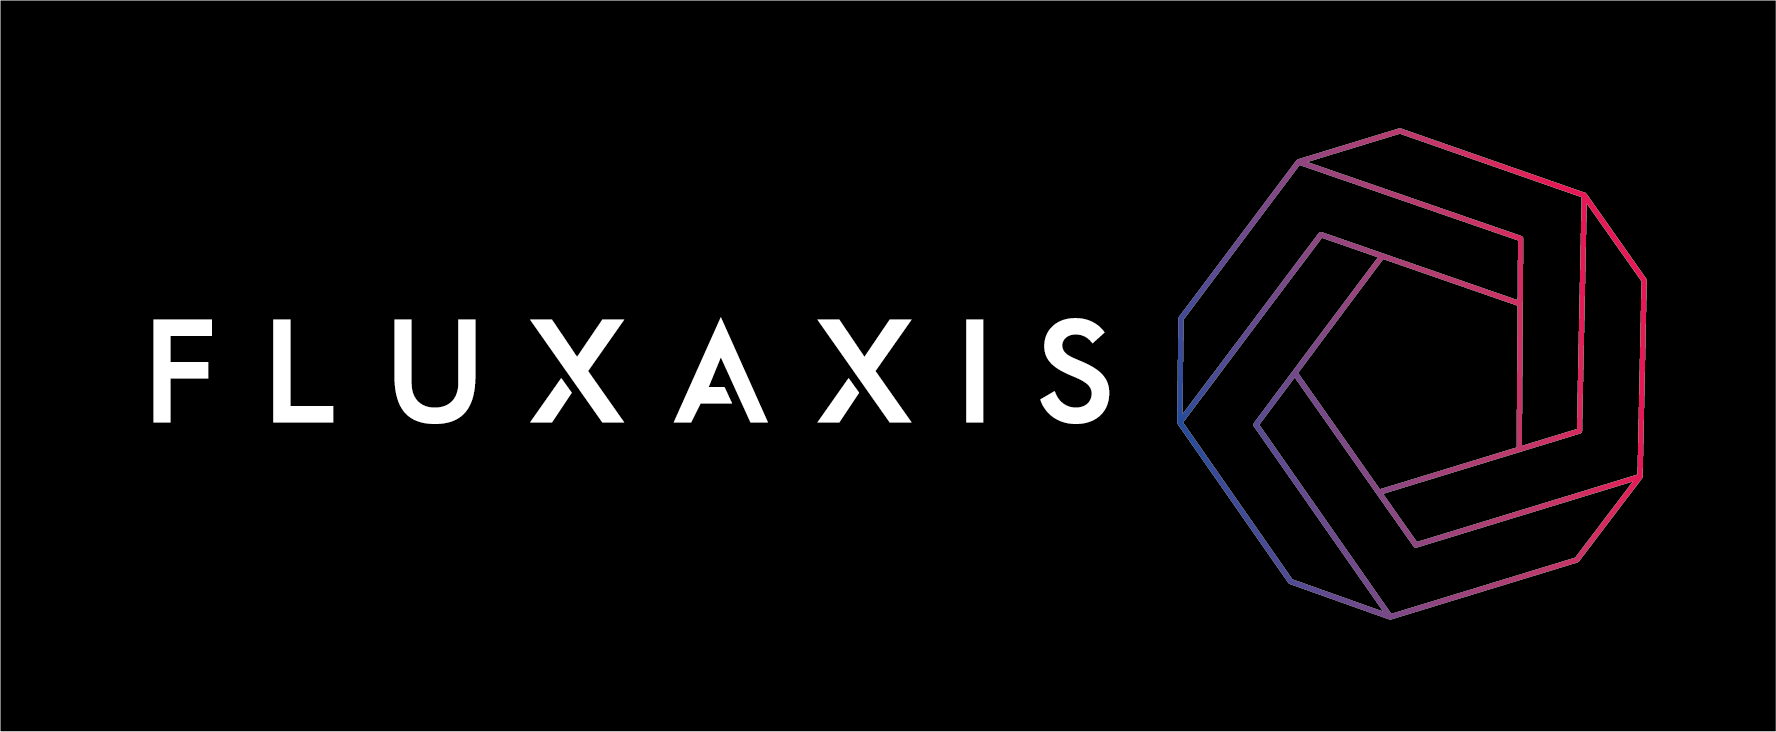 Fluxaxis Ltd